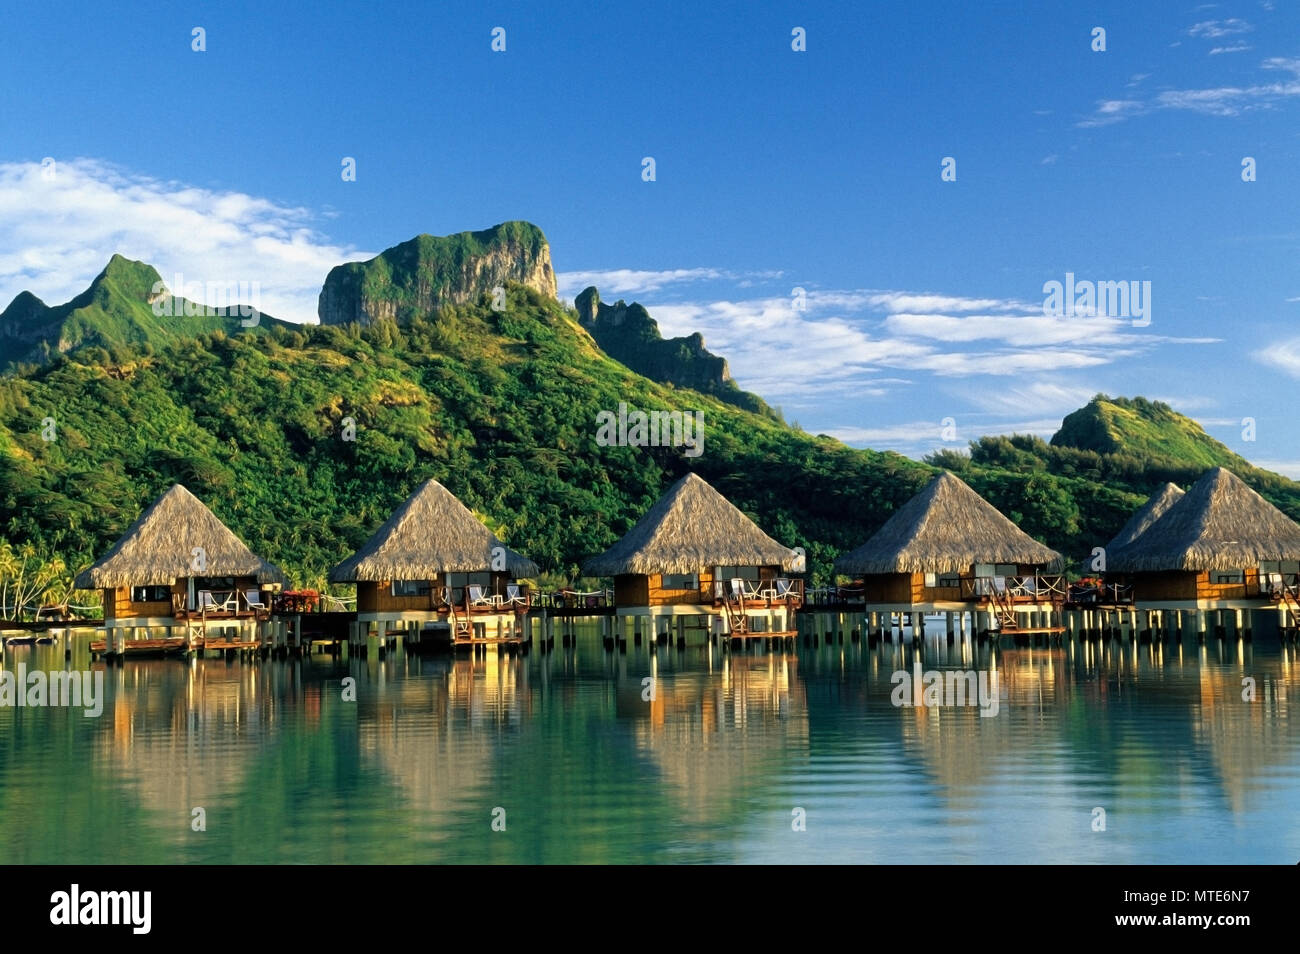 Moana Beach Park Royal Hotel, overwater bungalows, lagoon,  Matira Point,  Bora Bora. - Stock Image